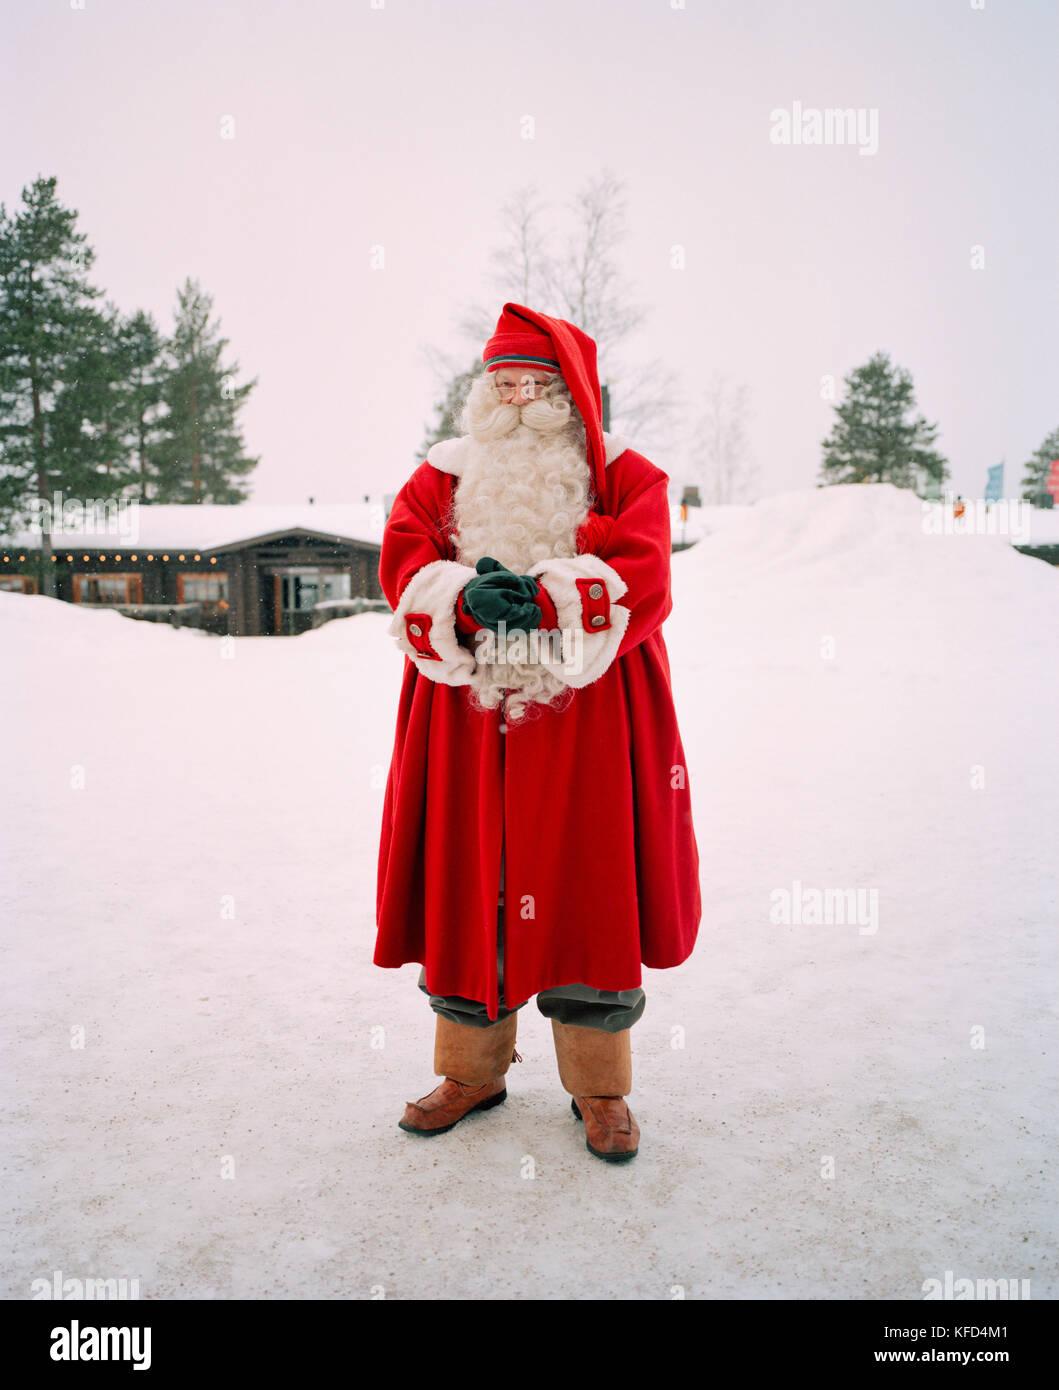 FINLAND, Rovaniemi, portrait of Santa Claus in the Santa Clause Village. - Stock Image